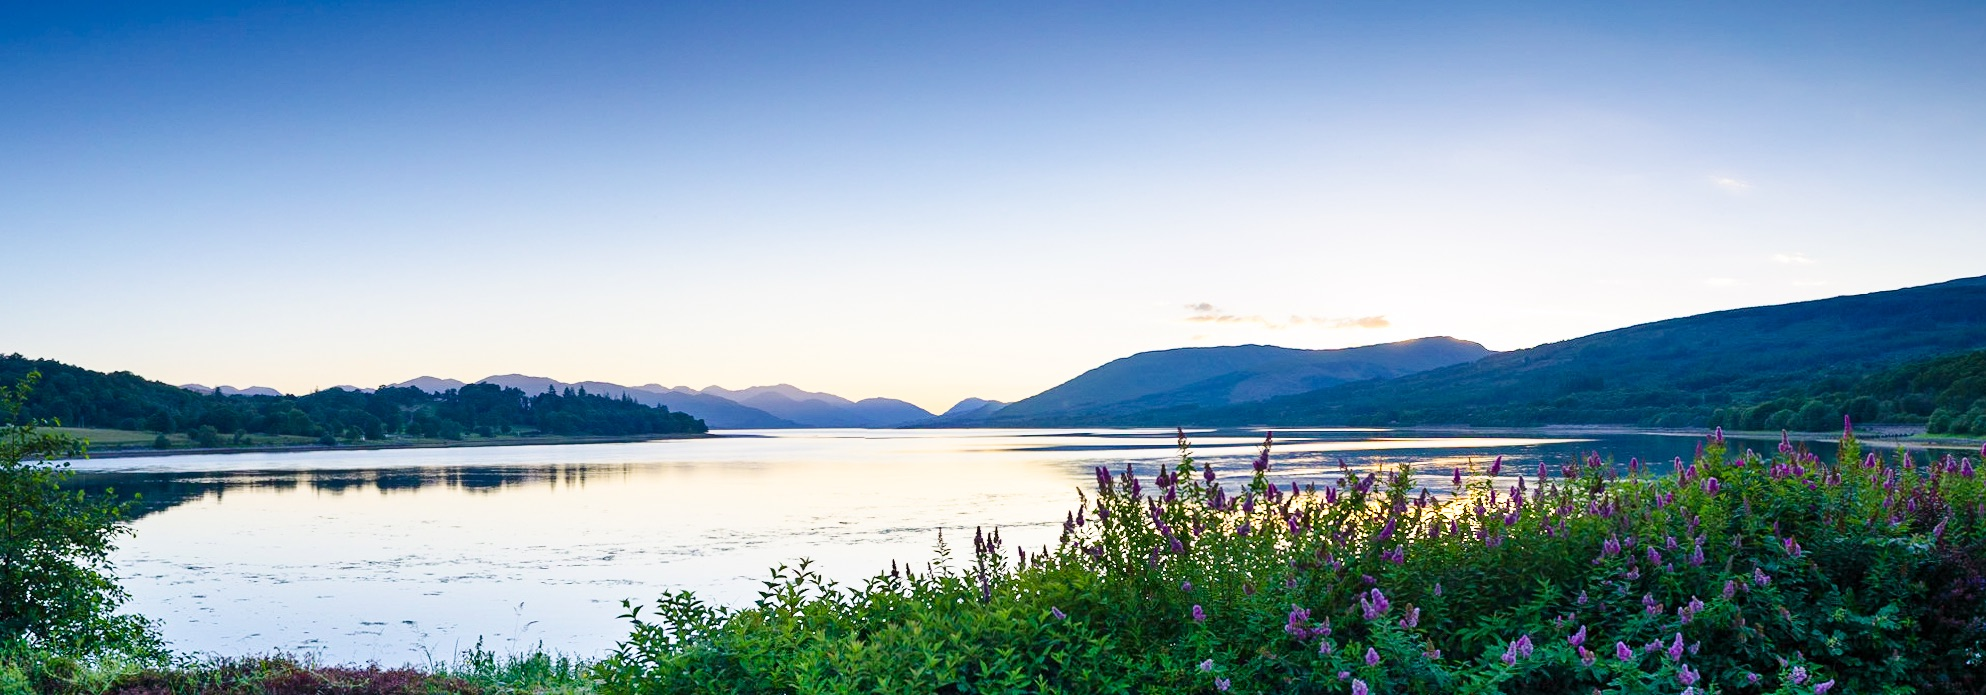 Loch Eil at Dusk